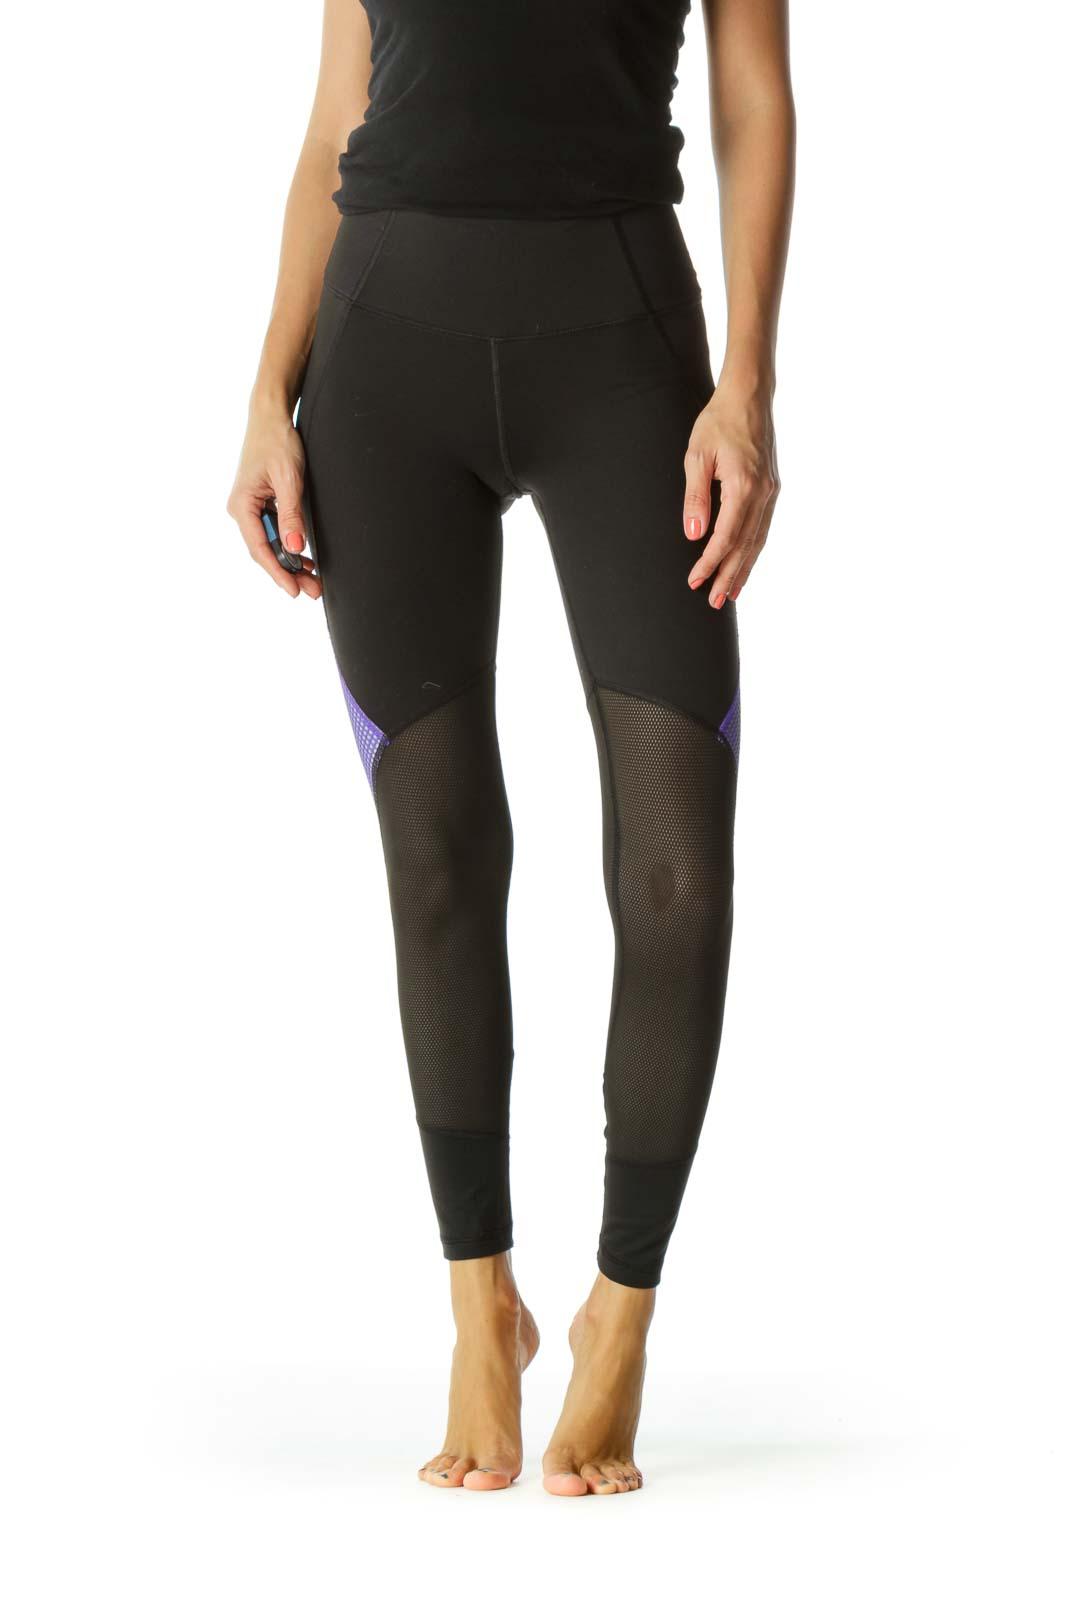 Black Purple Mesh Mixed-Media Sports Leggings with Inside Hip Pocket